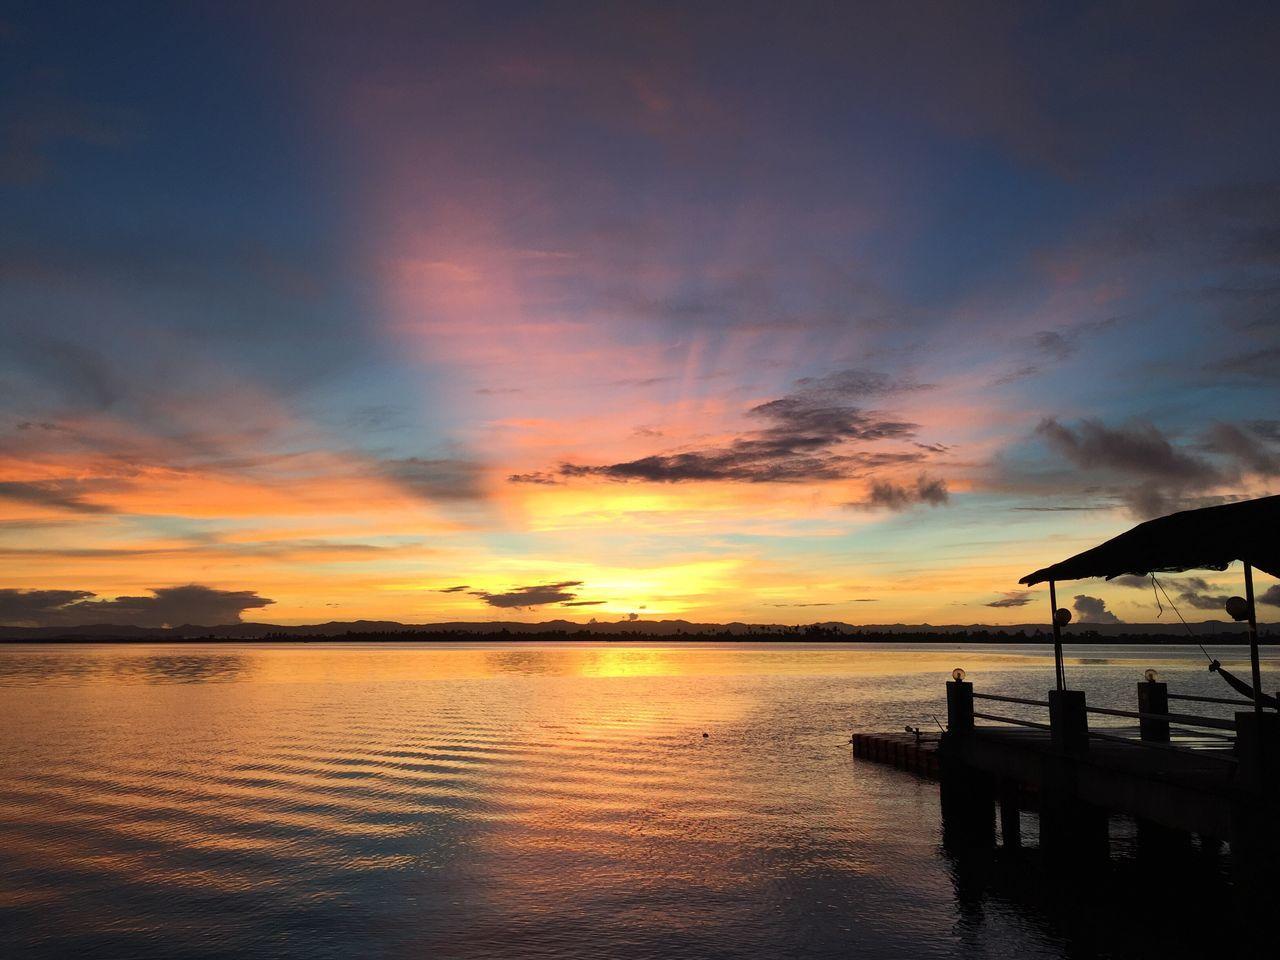 June 23, 2016. Cancabato Bay sunrise. No filters, pure beauty. First Eyeem Photo